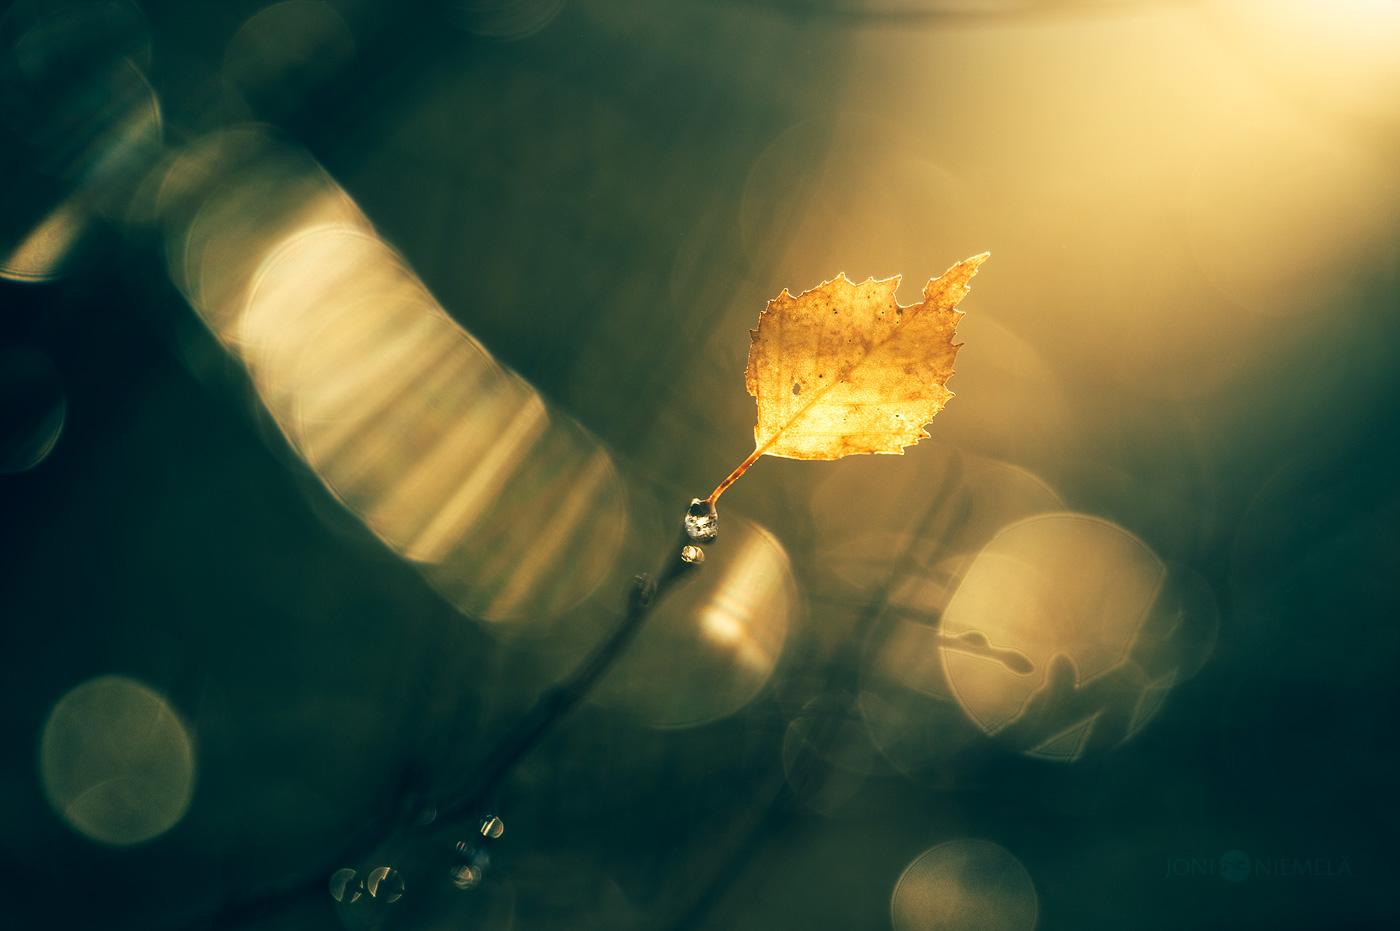 Reaching The Light